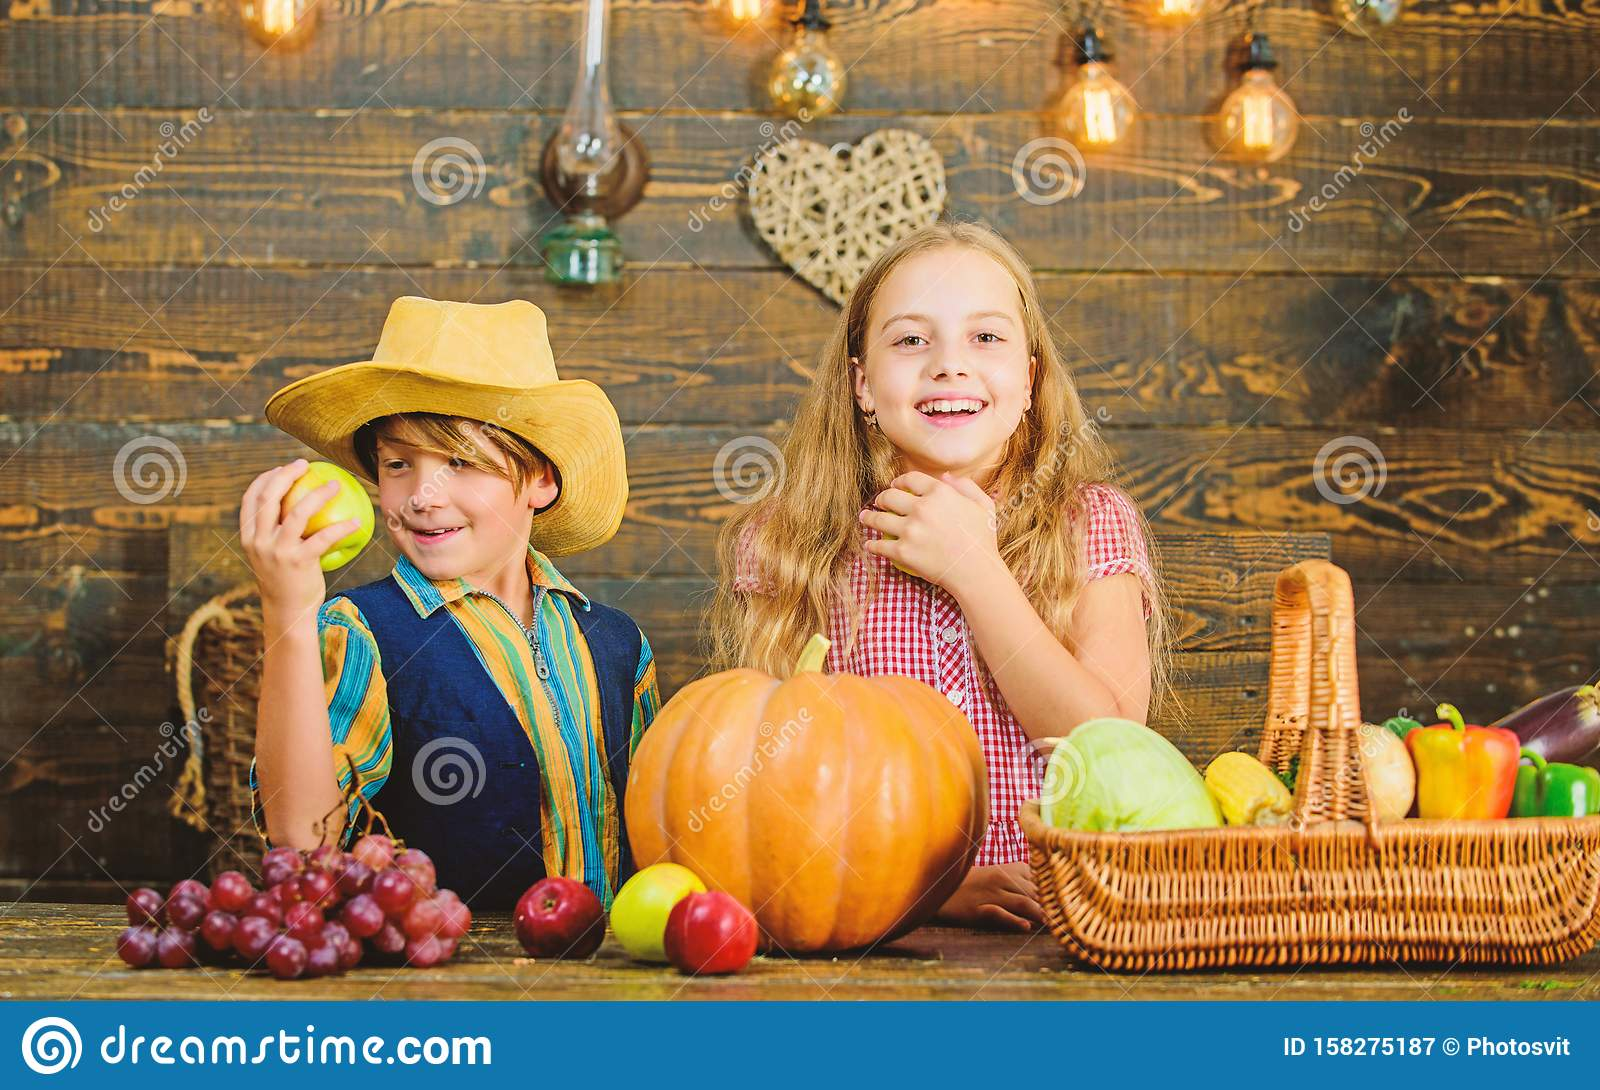 School Festival Holiday. Elementary School Fall Festival Idea. Celebrate Harvest Festival ...